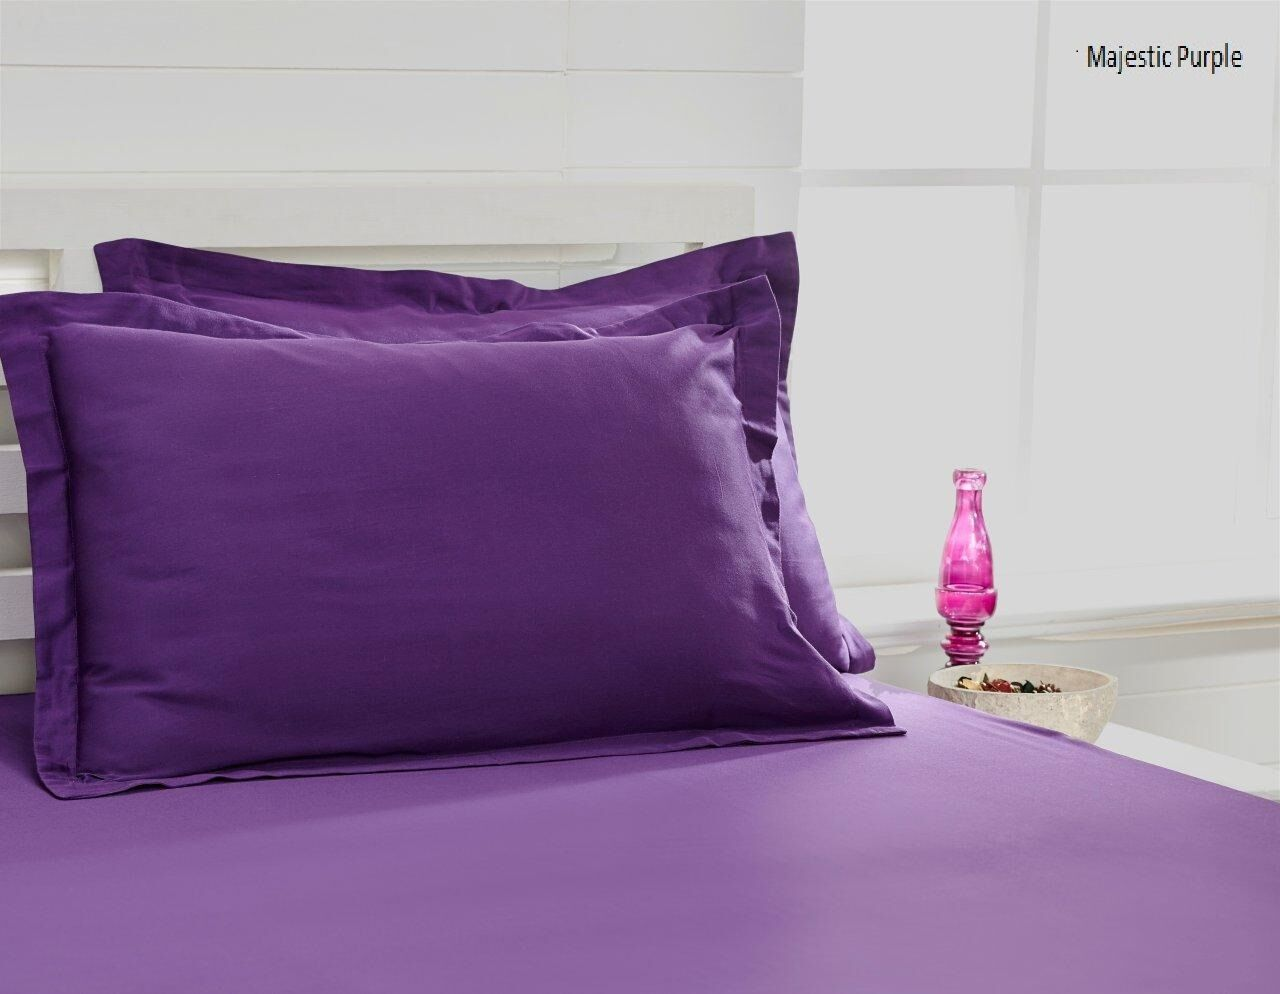 300 Thread Count 100% Cotton Sheet Set Size: King, Color: Majestic Violet